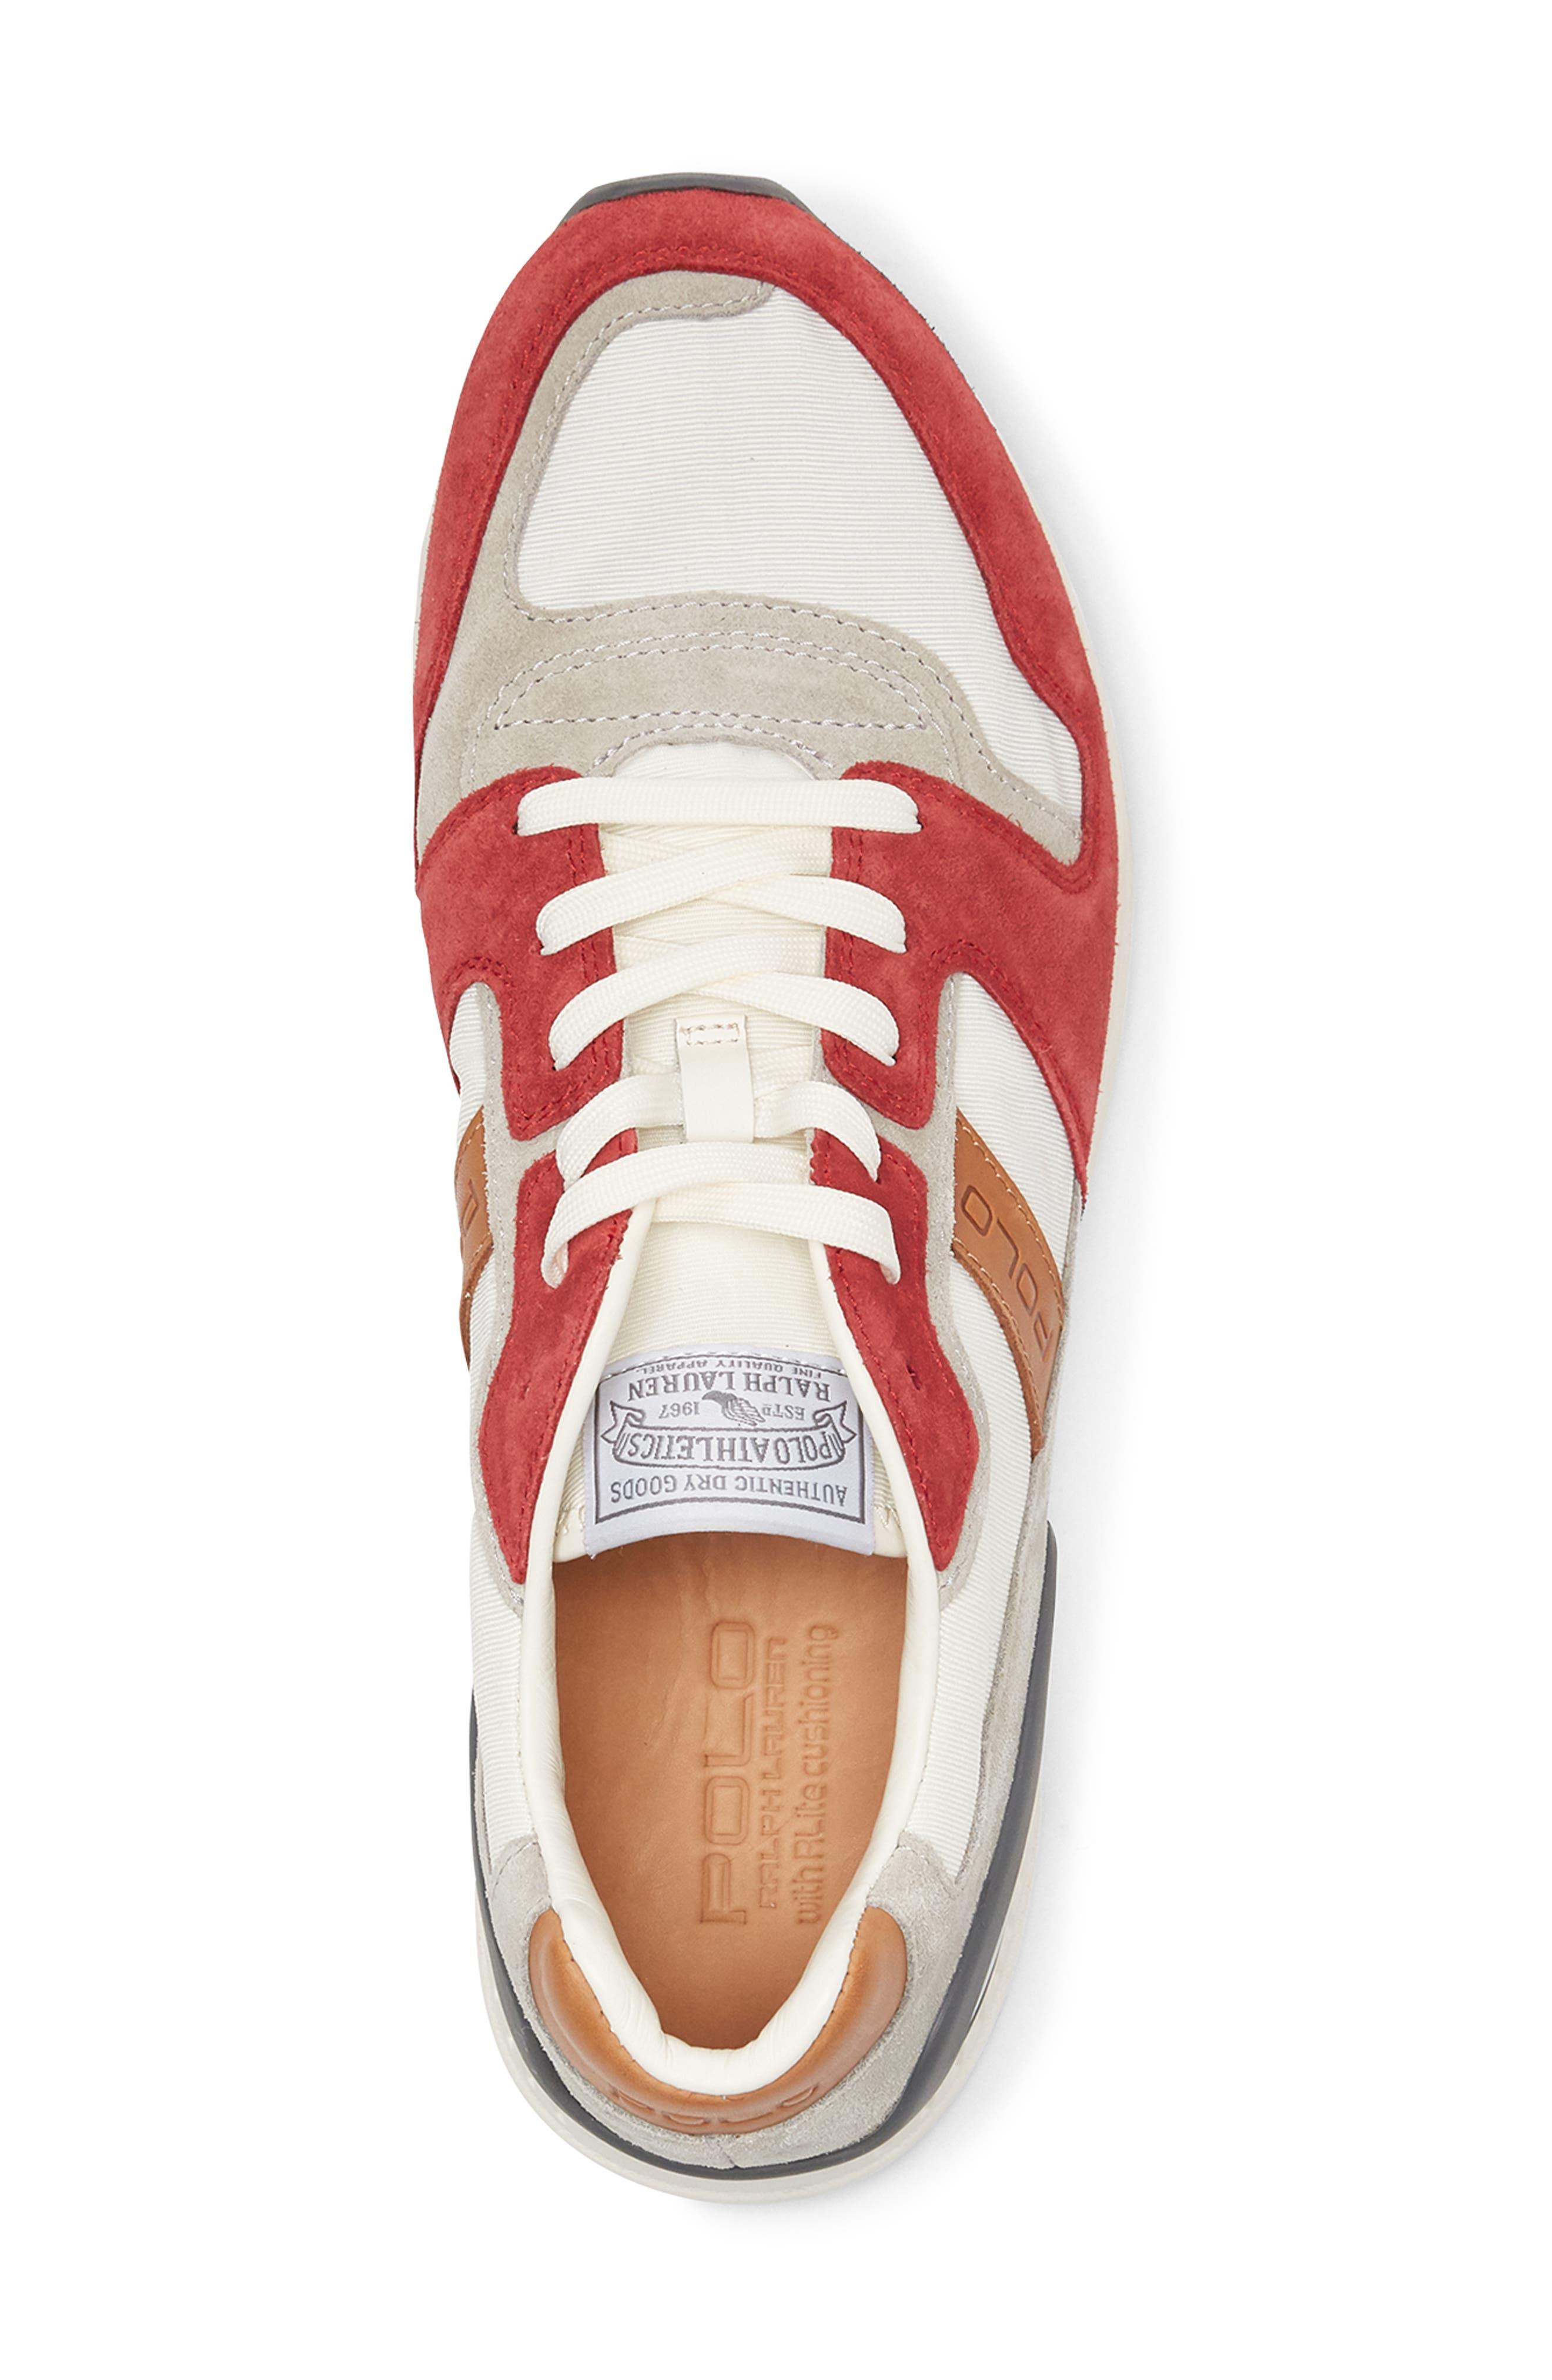 Train 100 Retro Sneaker,                             Alternate thumbnail 3, color,                             RED NYLON/ SUEDE